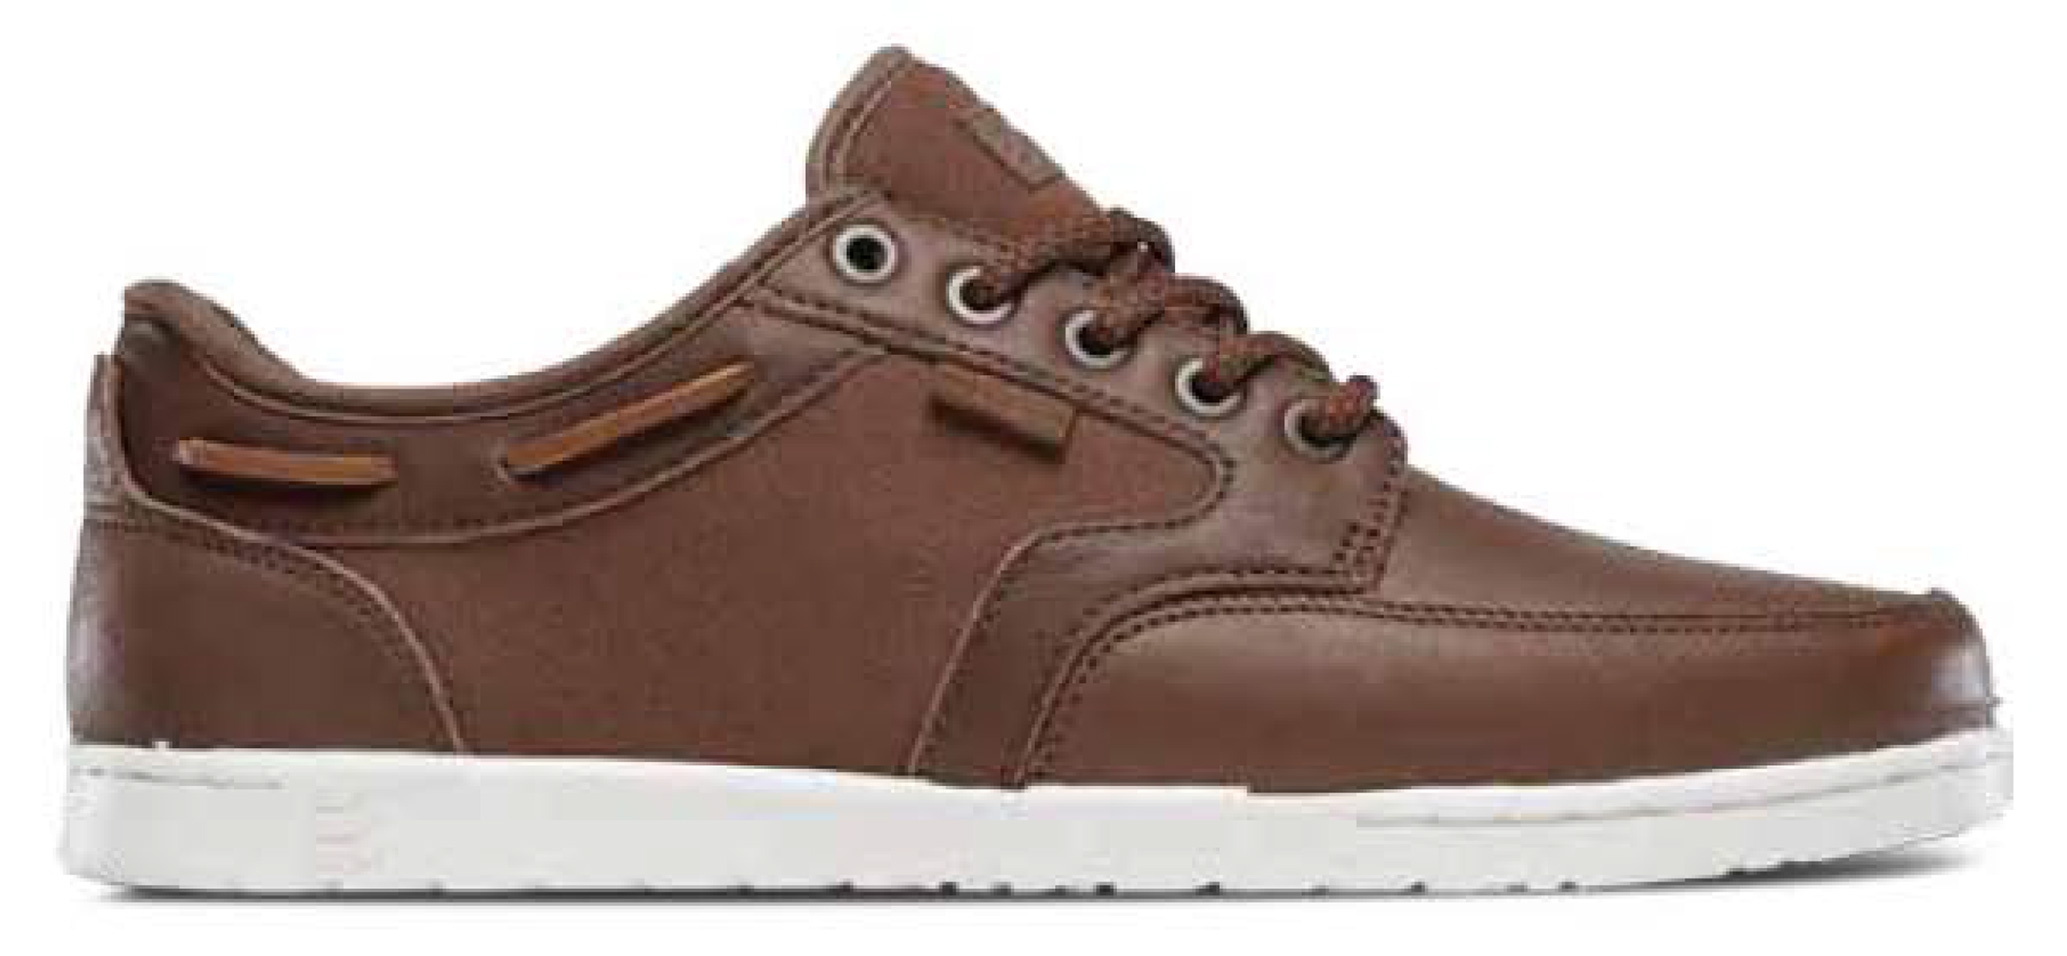 b406afbf54c Chaussures de Skate ETNIES DORY Marron